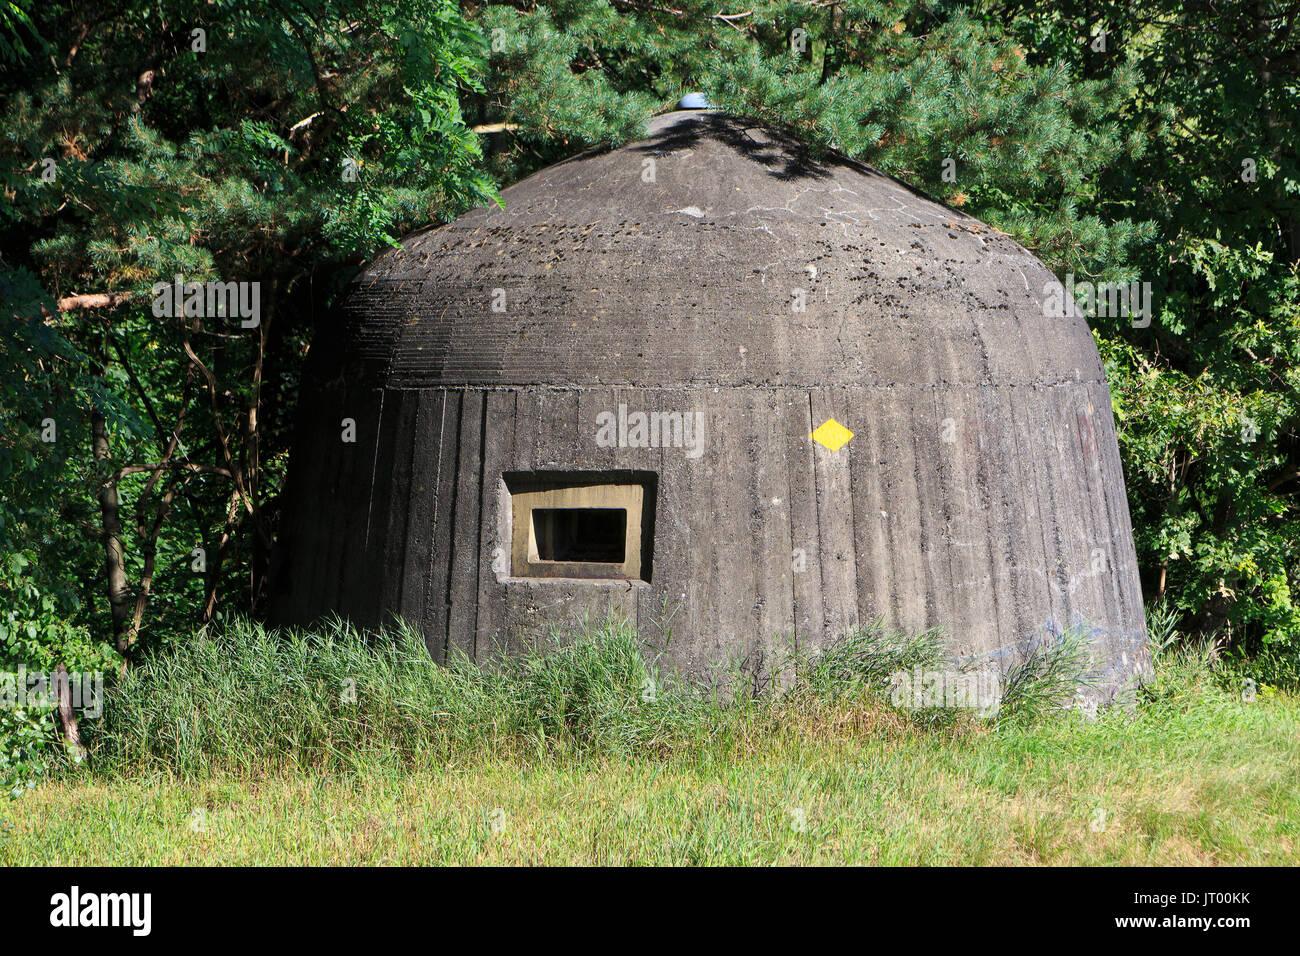 World War II bunker located on the Swiss side of the bridge (across the river Rhine) leading to Vaduz, Liechtenstein - Stock Image